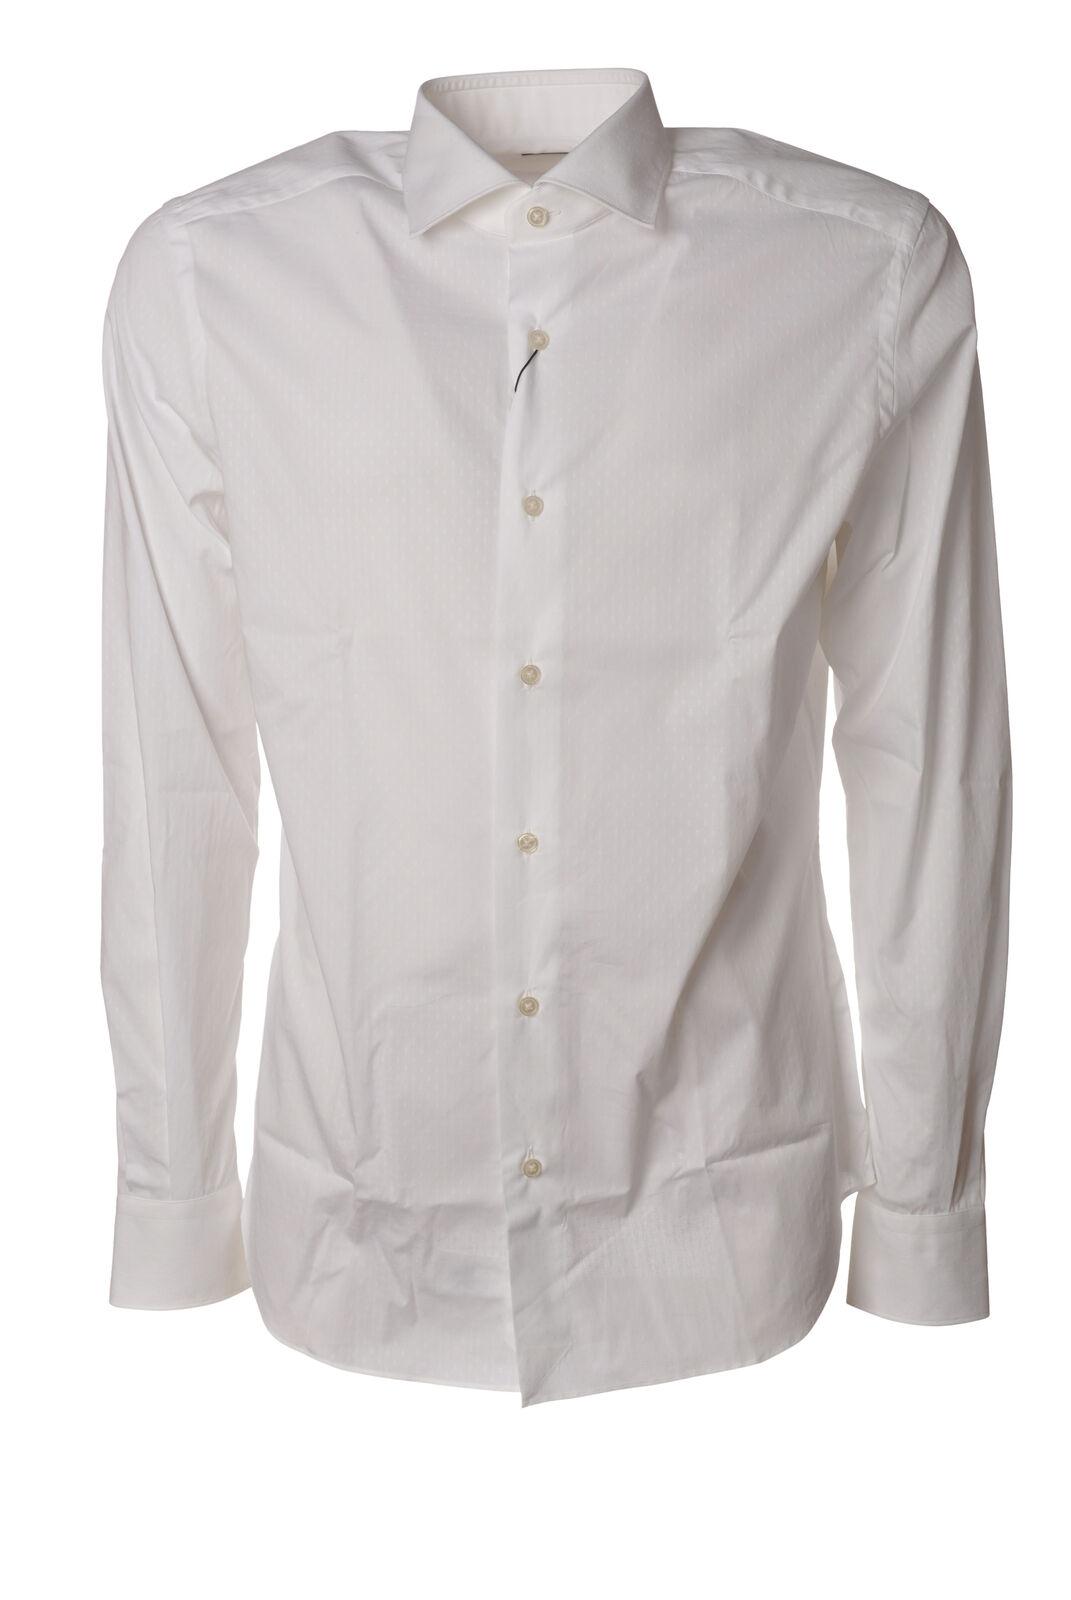 Xacus - Camicie-Camicie collo francia - herren - Bianco - 6057028I191106